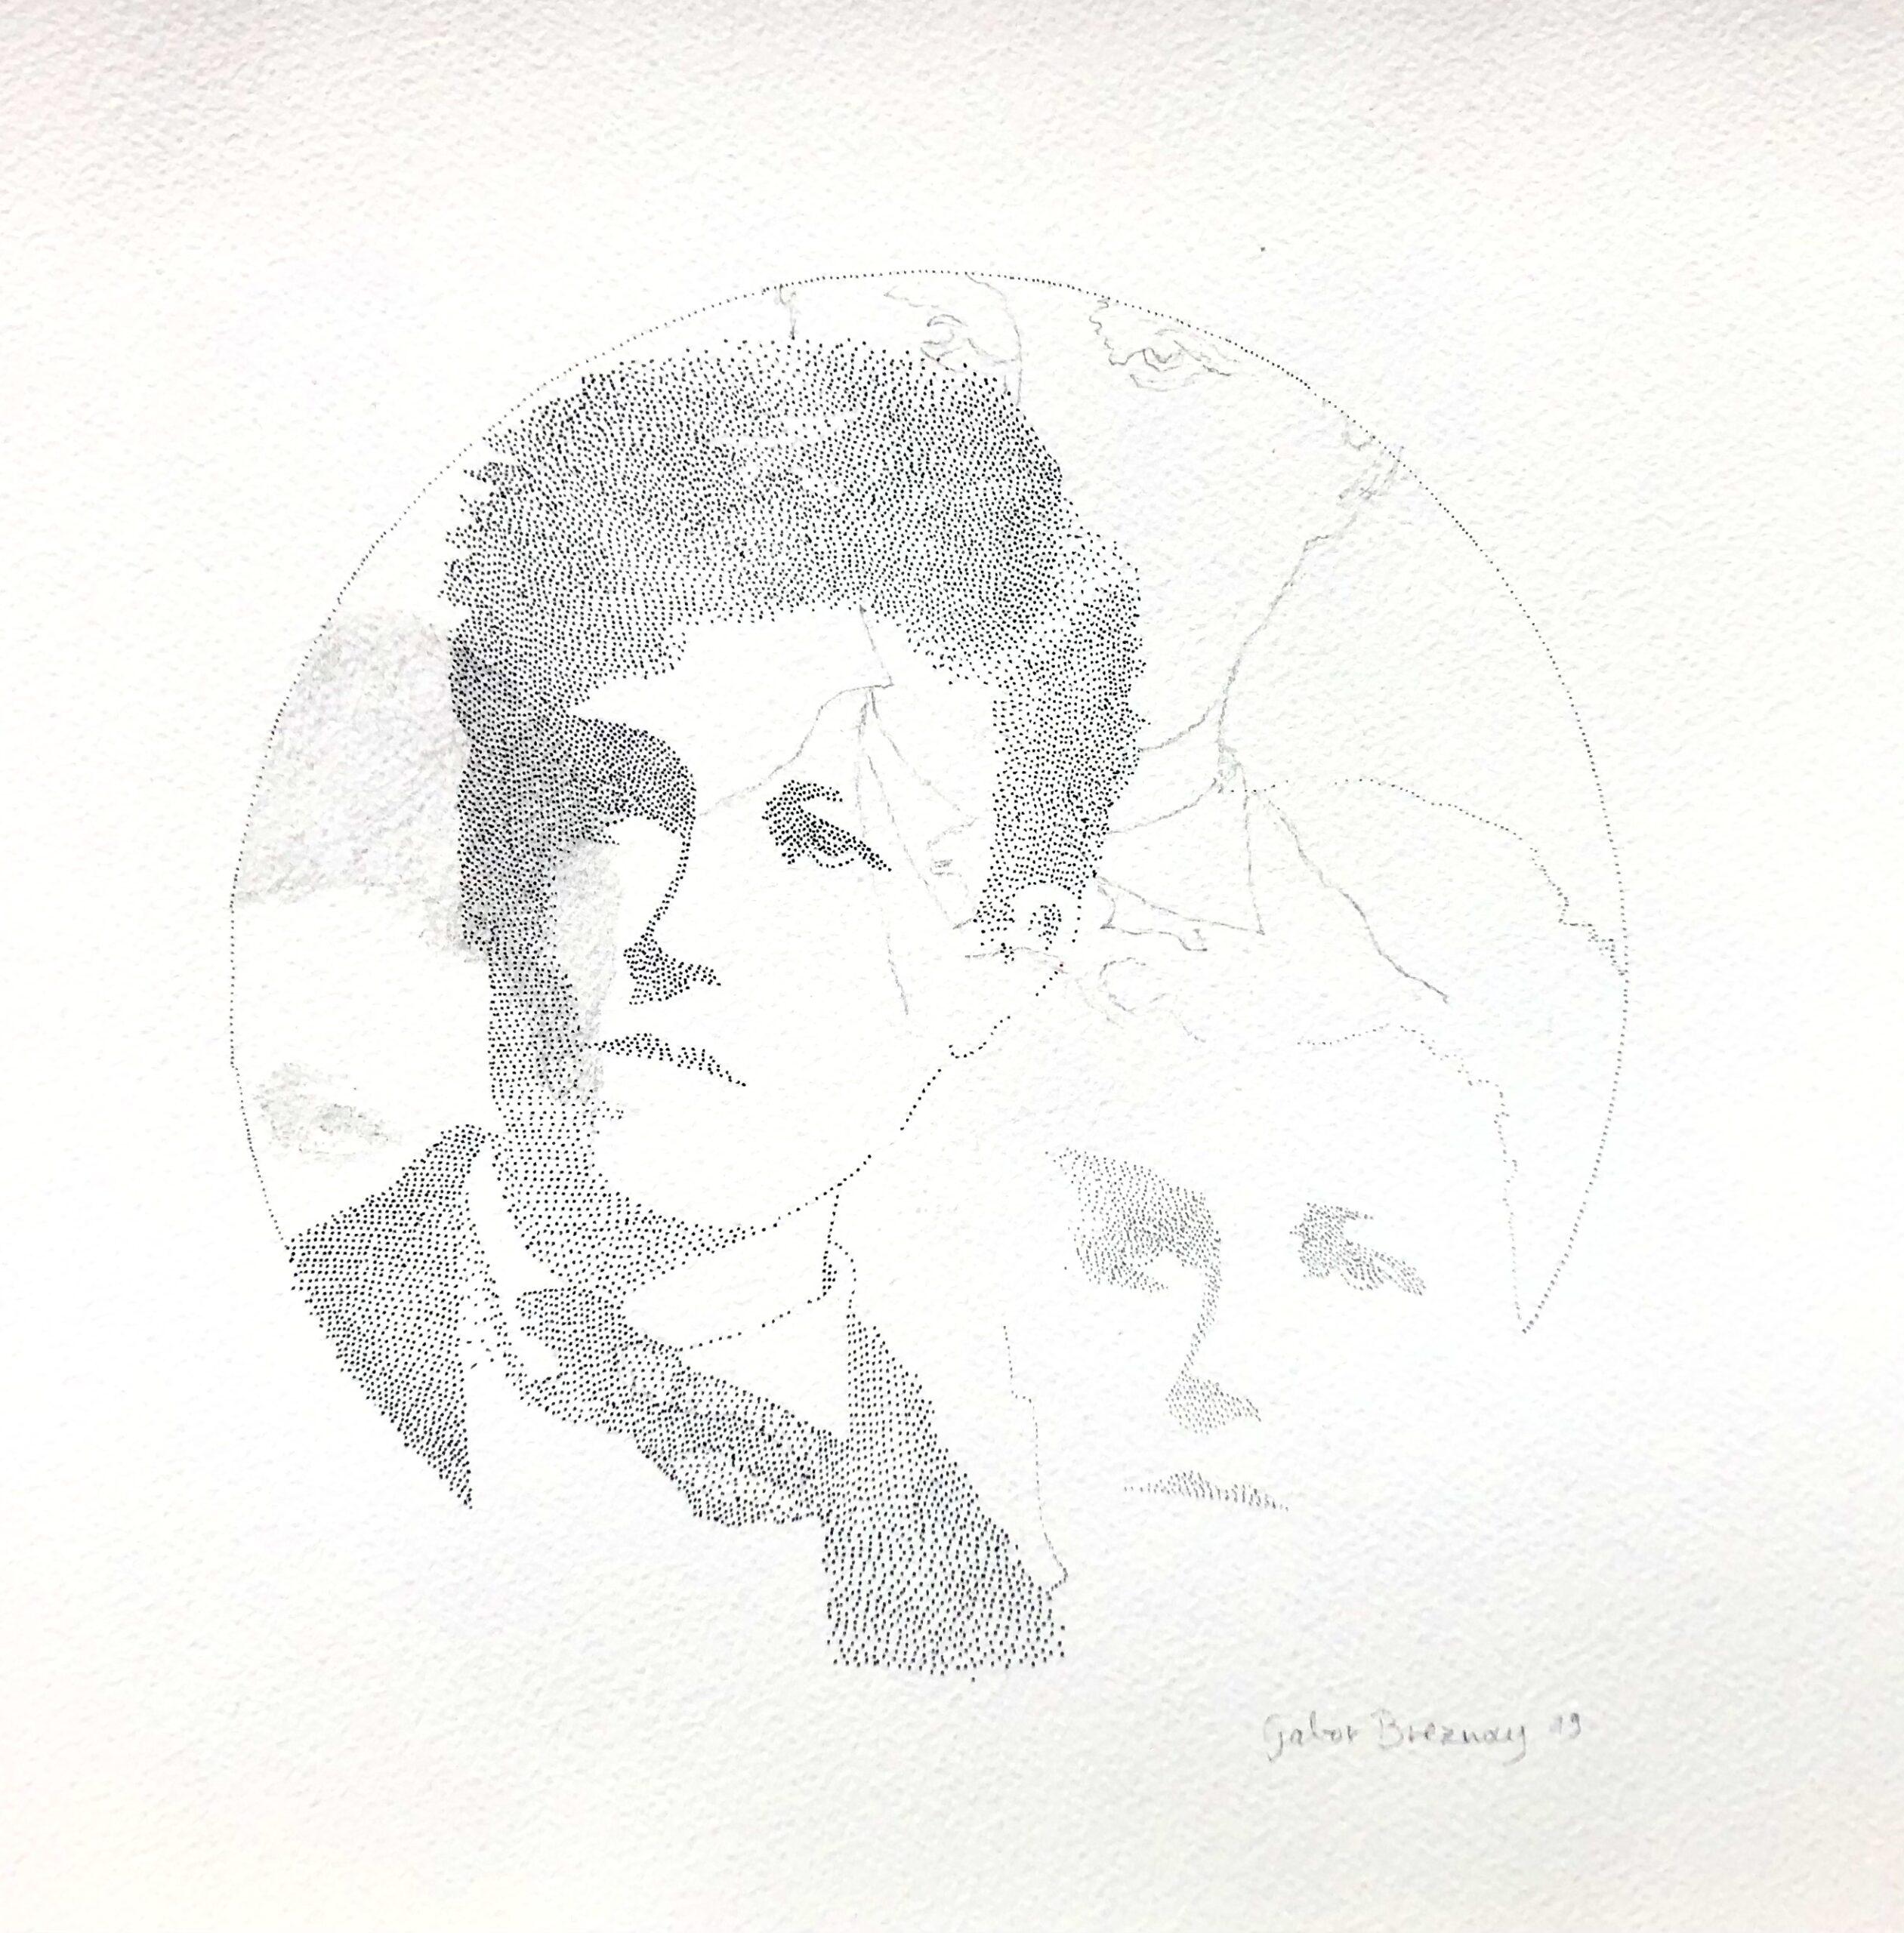 Etude Rimbaud 3 (Gabor Breznay)